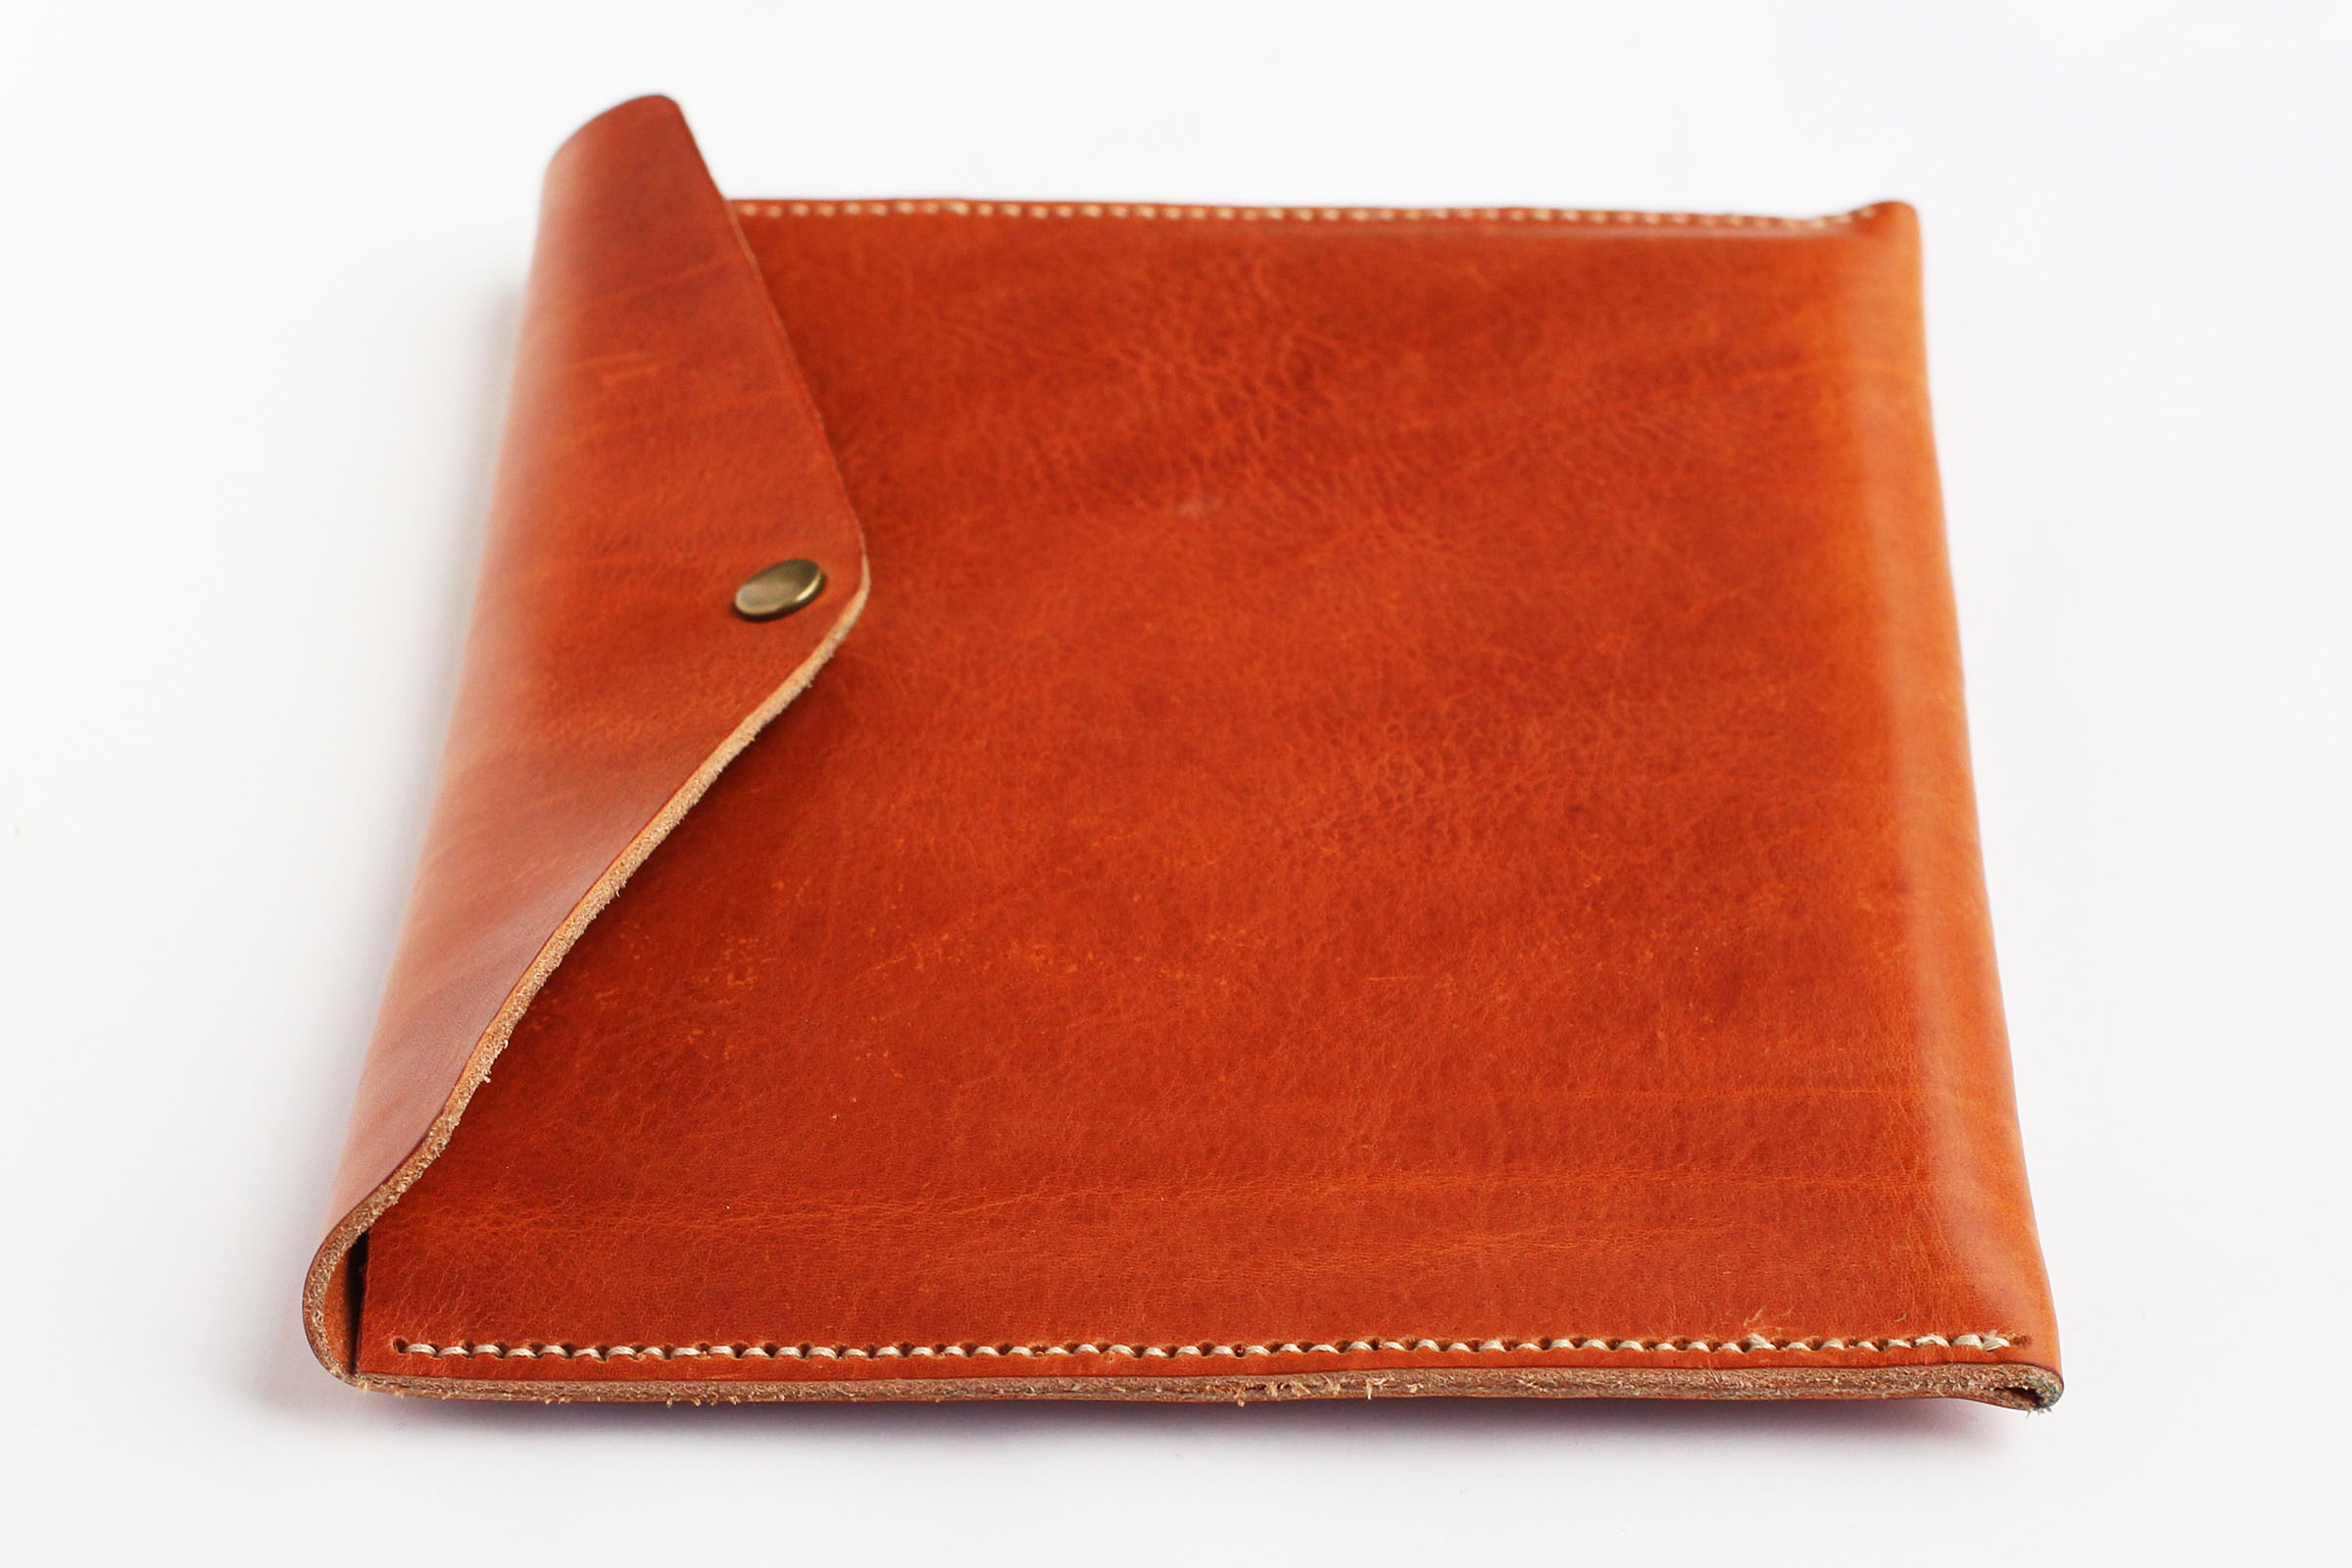 ipad-sleeve5-caesar-zwolle-strategy-design